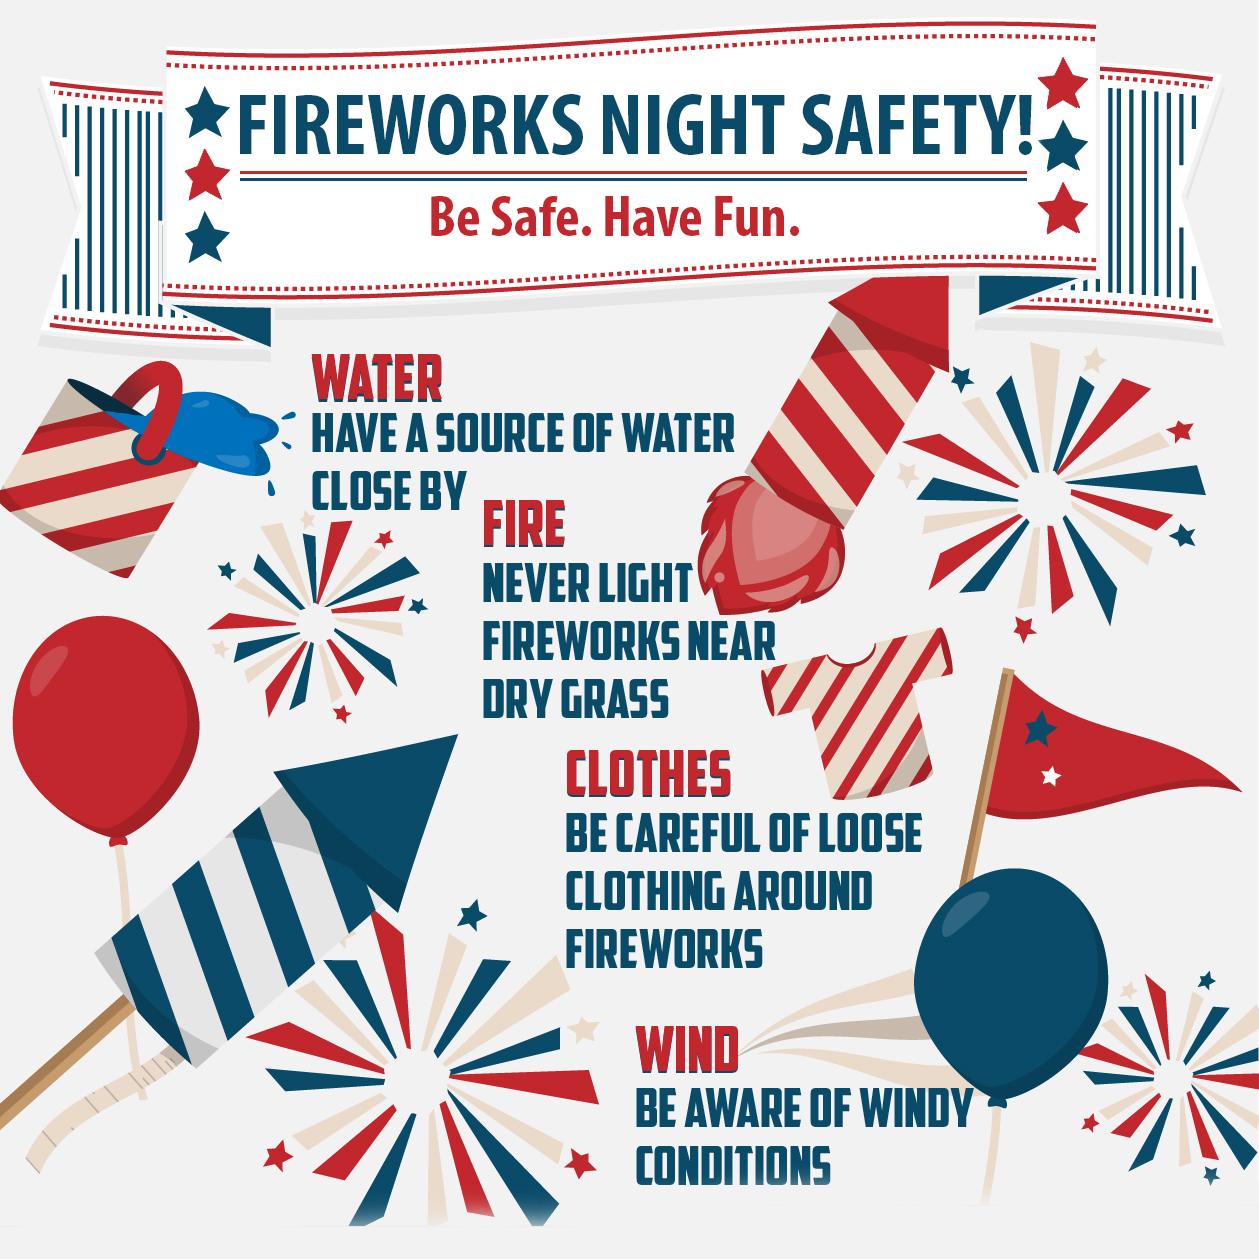 Fireworks Night Safety